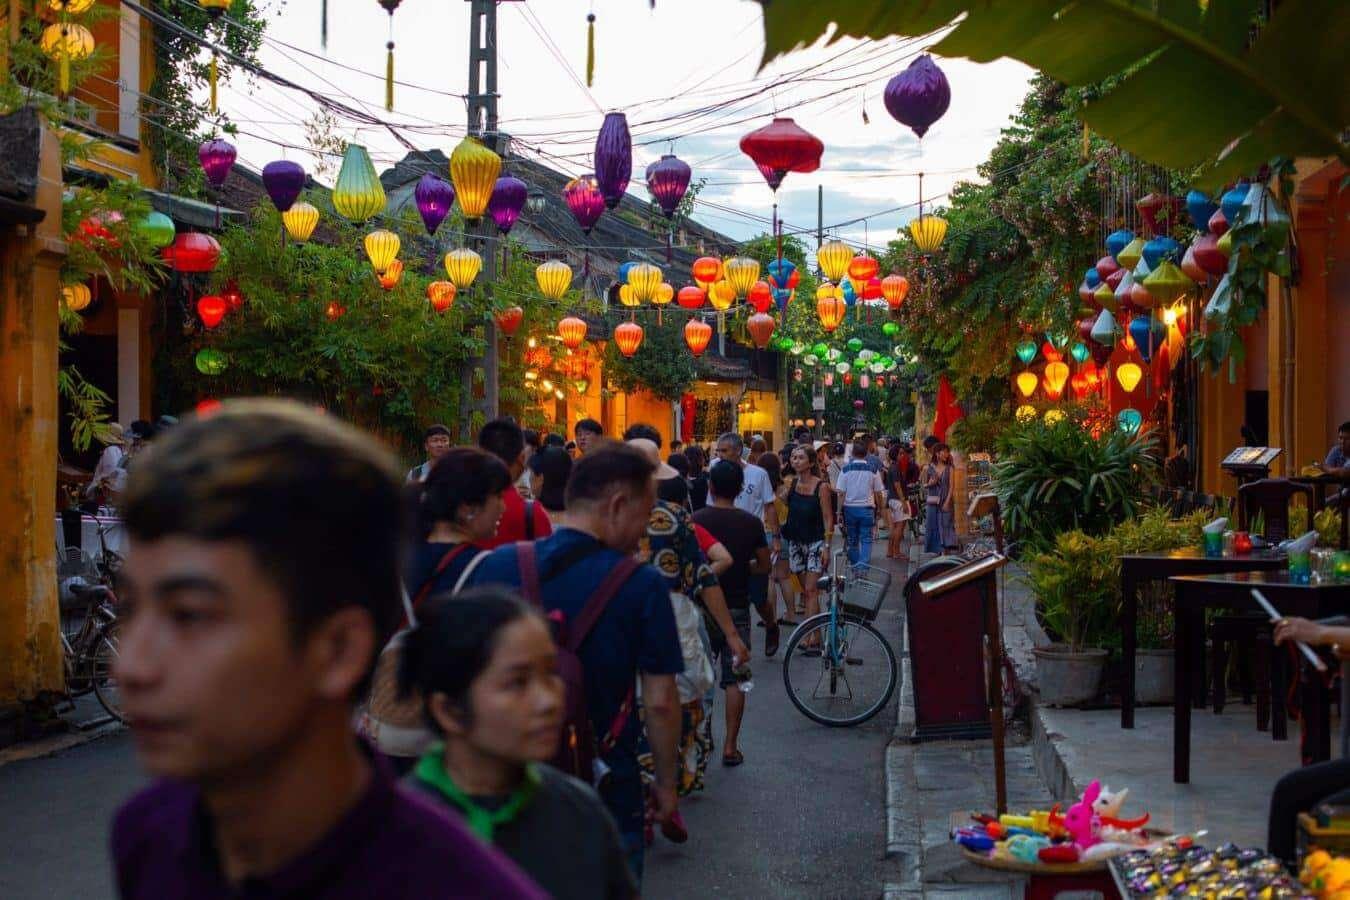 Full moon lantern festival - busy Hoi An street